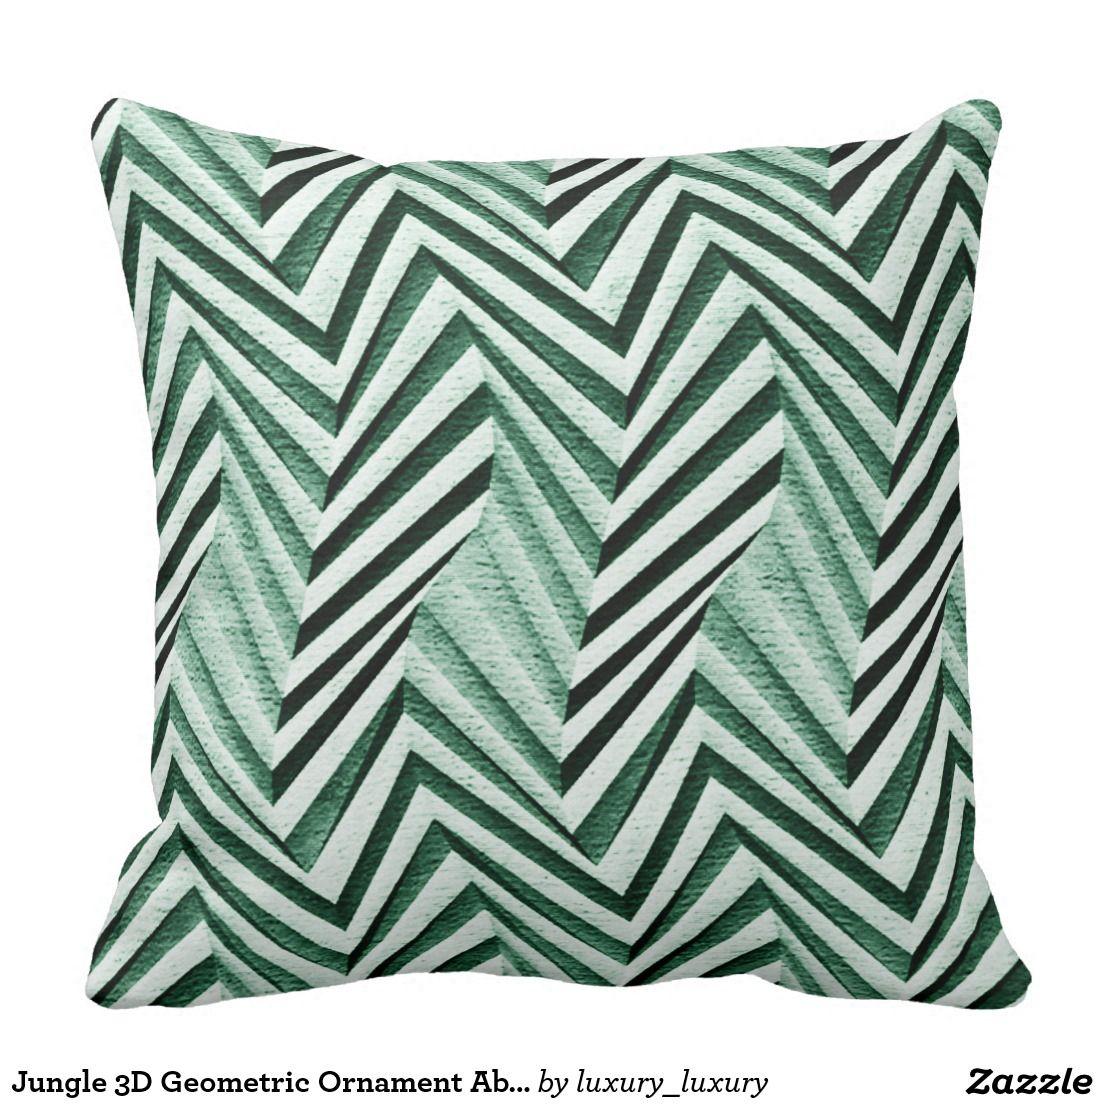 Jungle 3D Geometric Ornament Abstract Minimalism Cushions